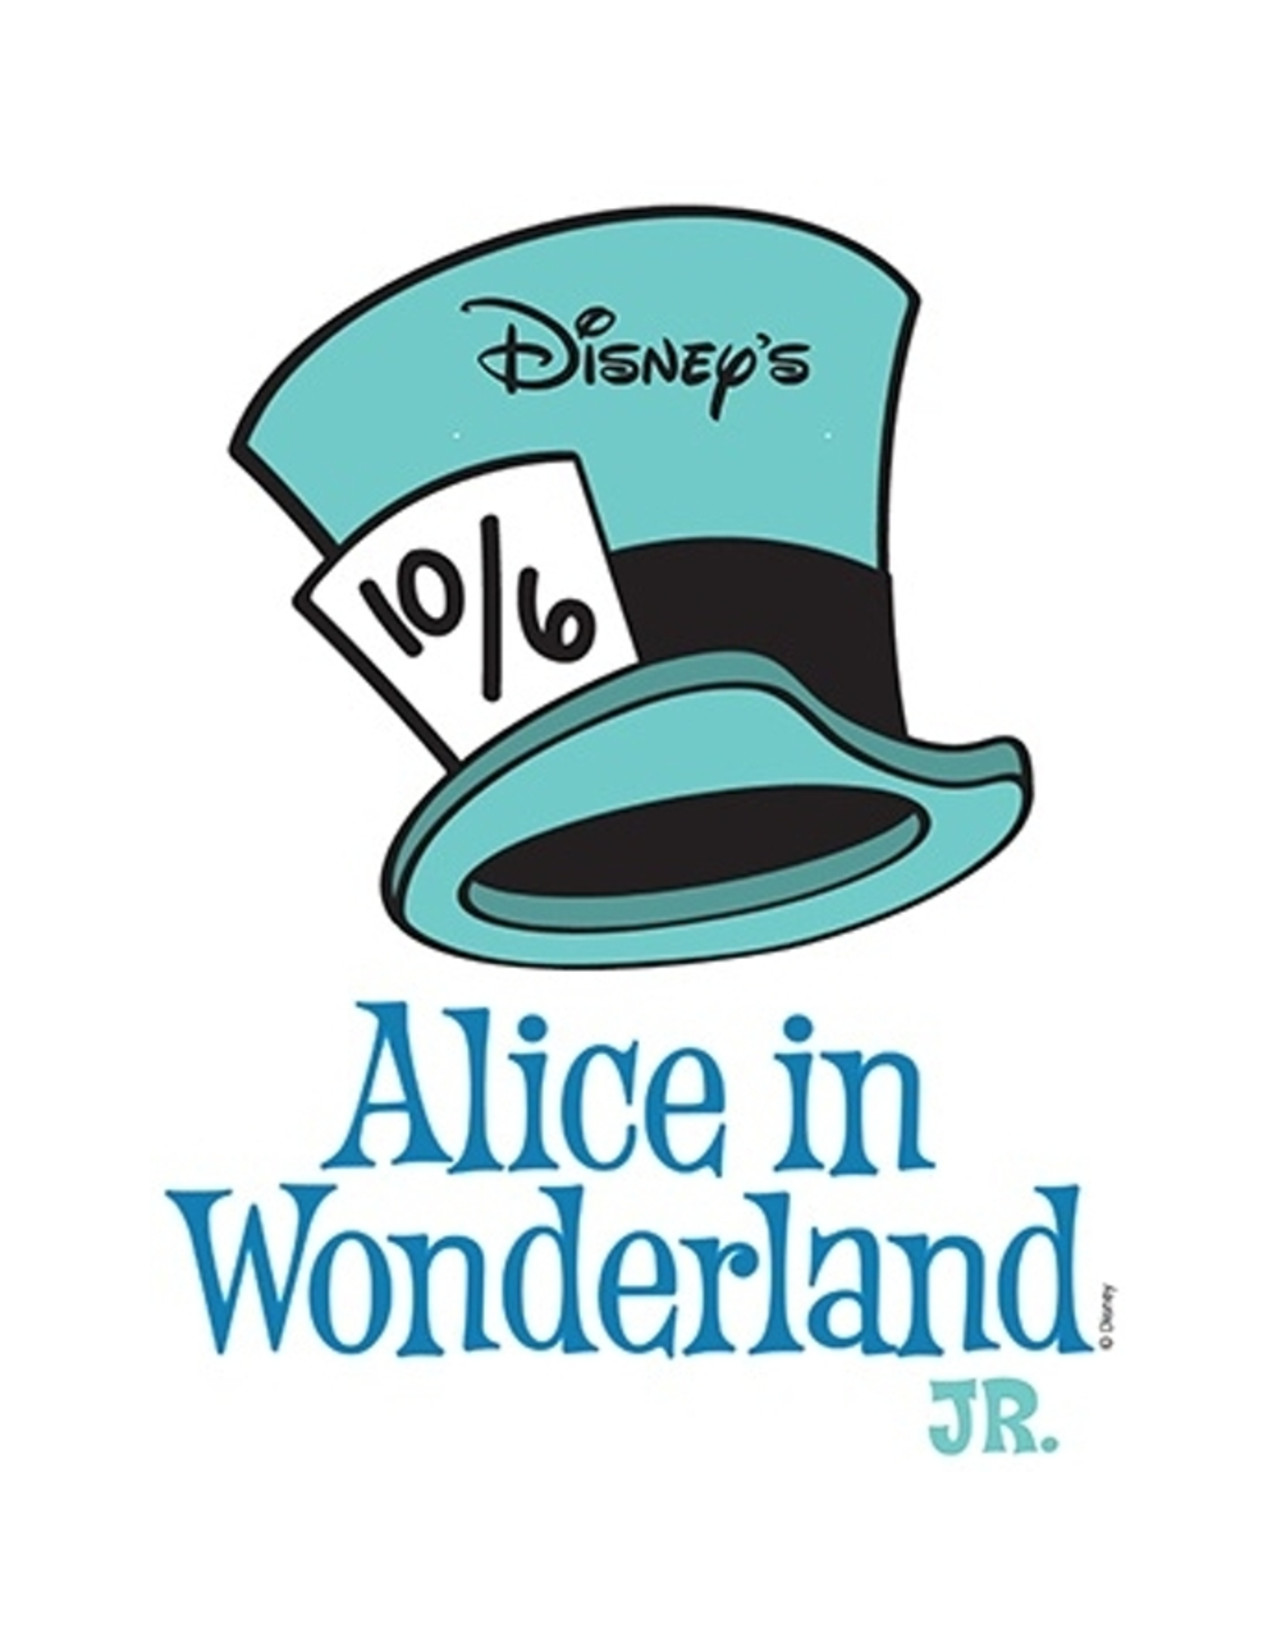 Alice in Wonderland Logo_p001.jpg